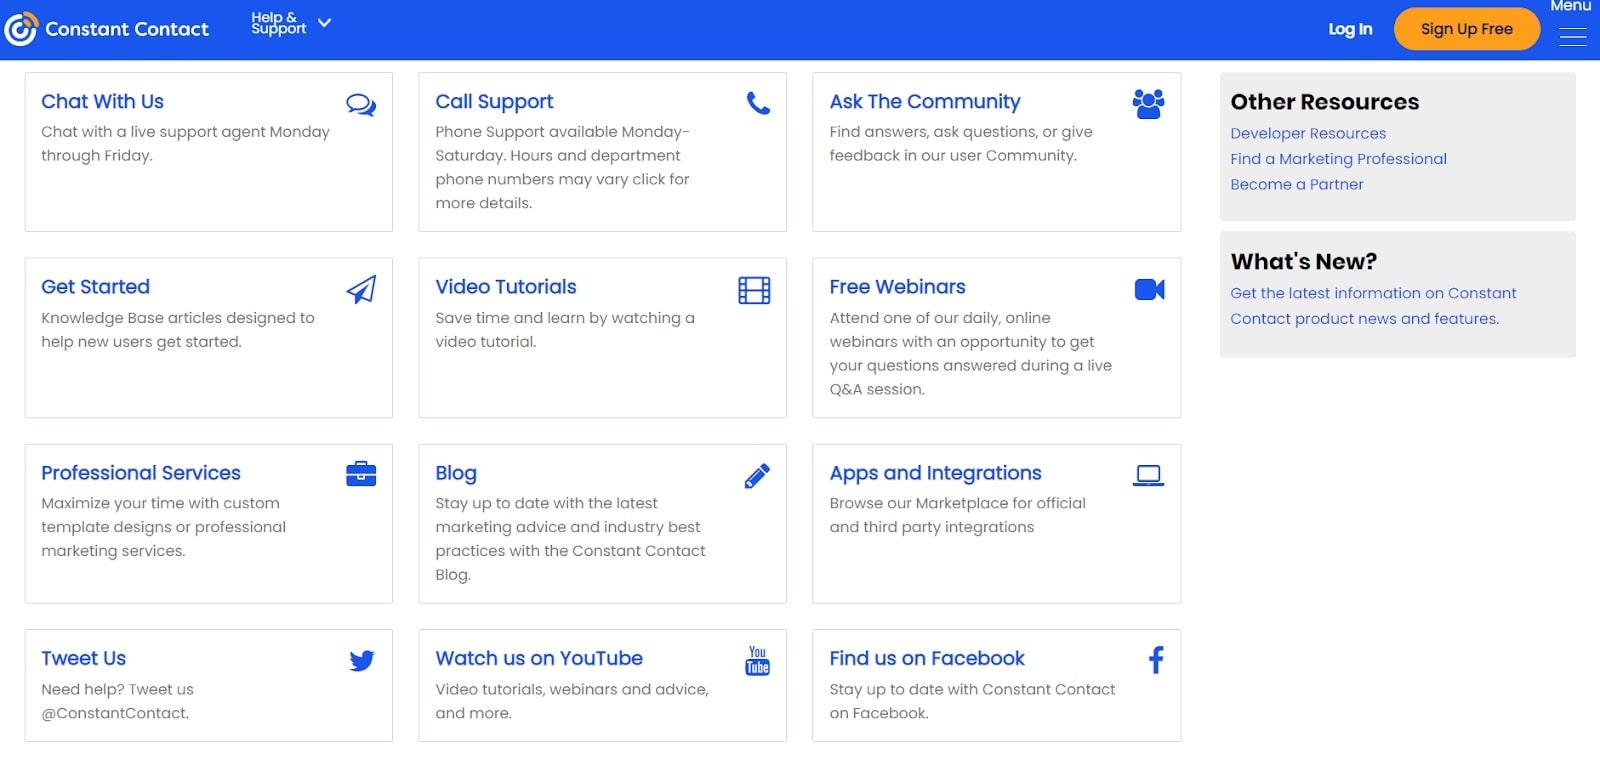 Constant Contact website builder review